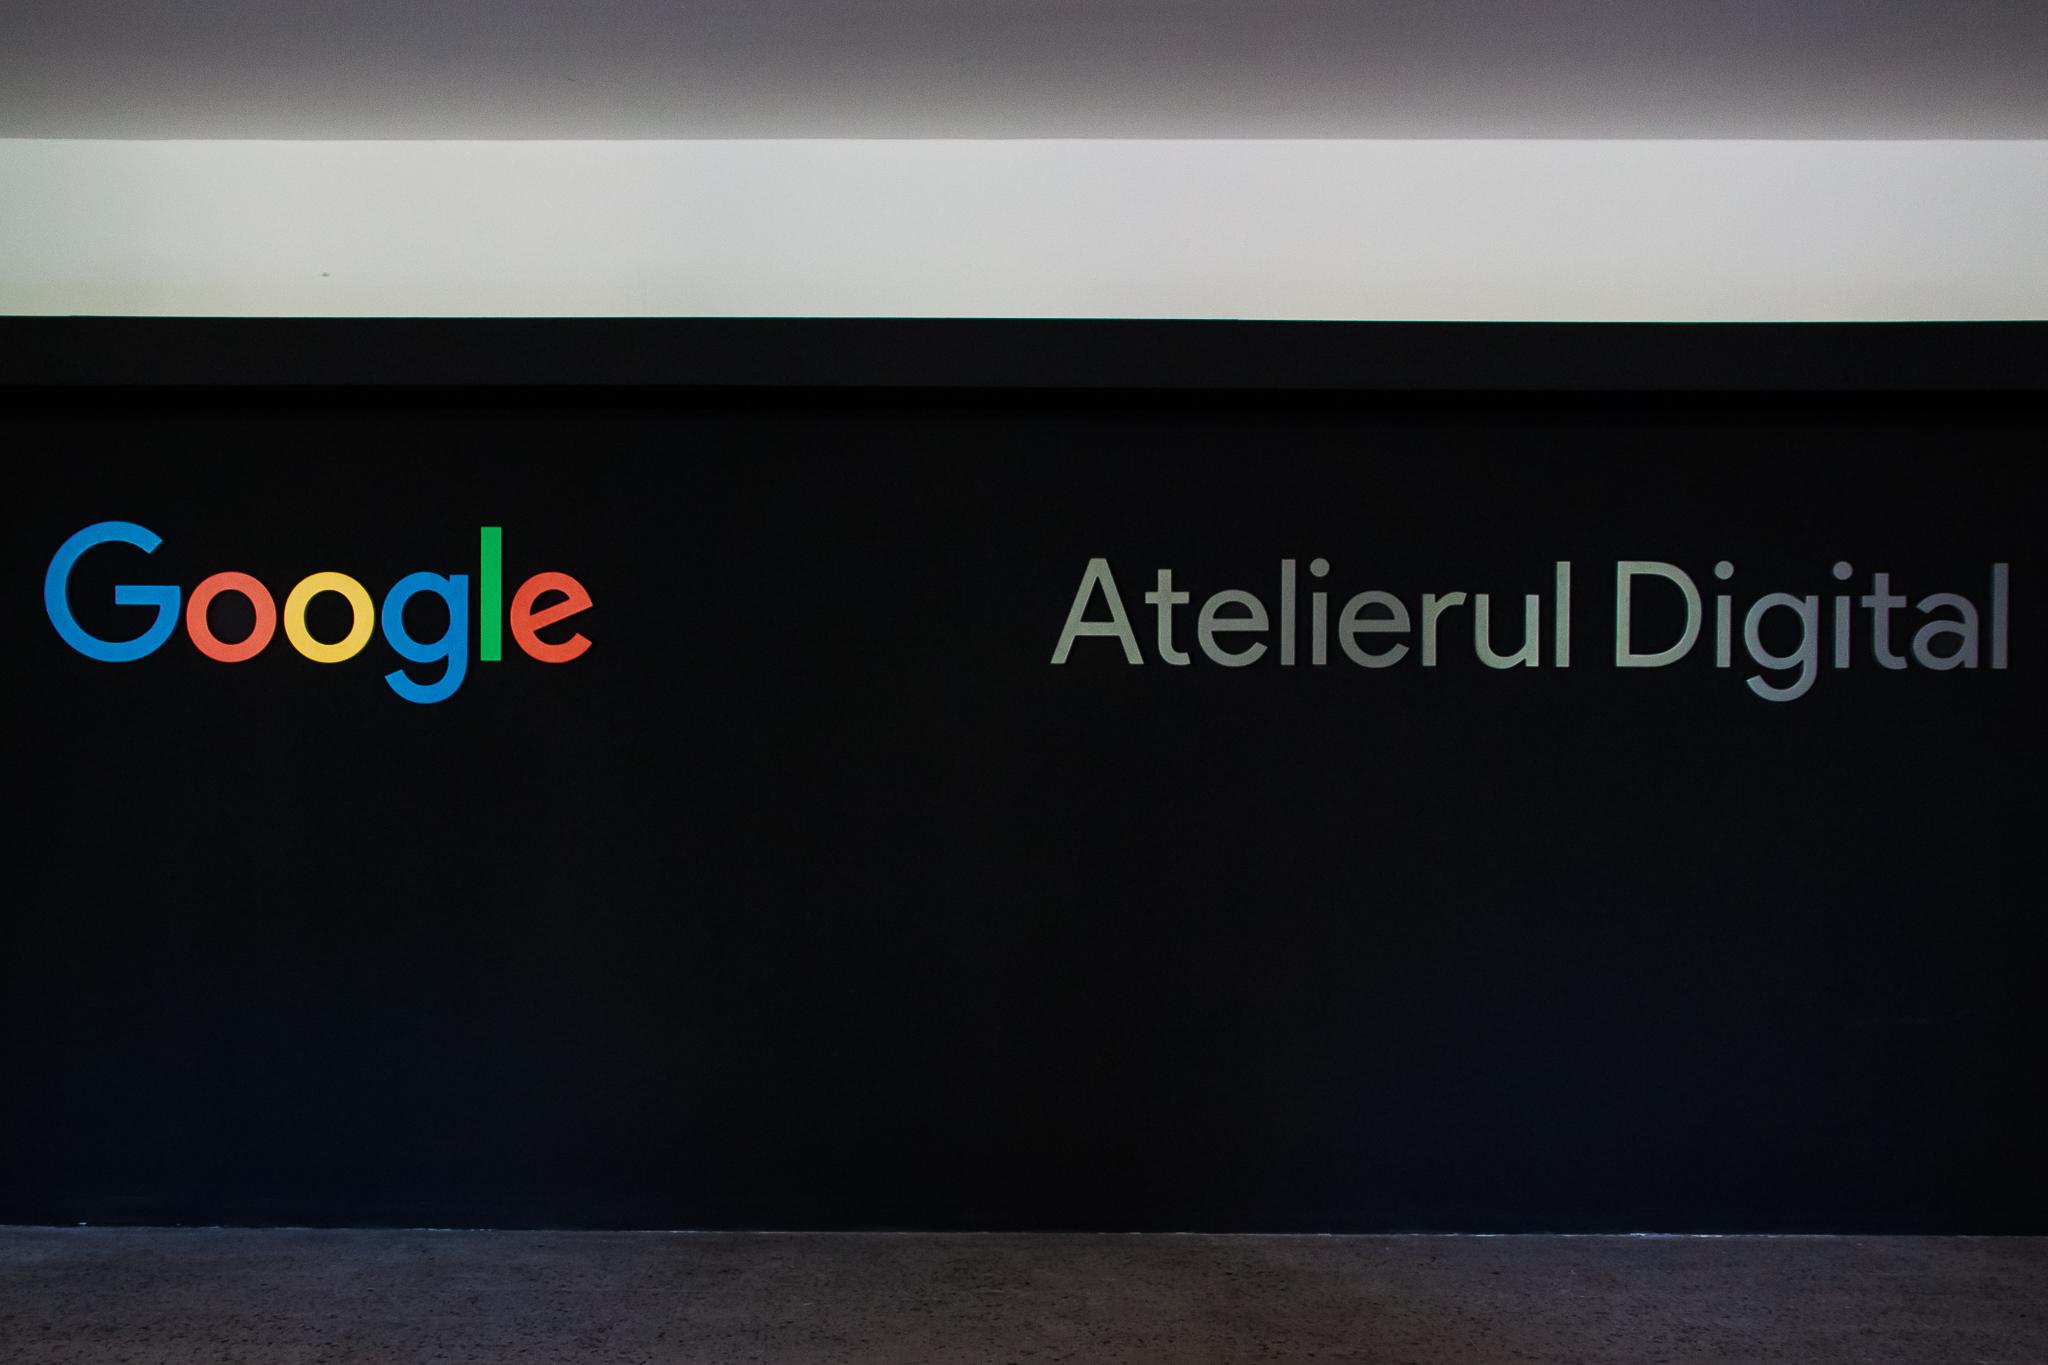 Google deschide hub-uri in 6 orașe universitare